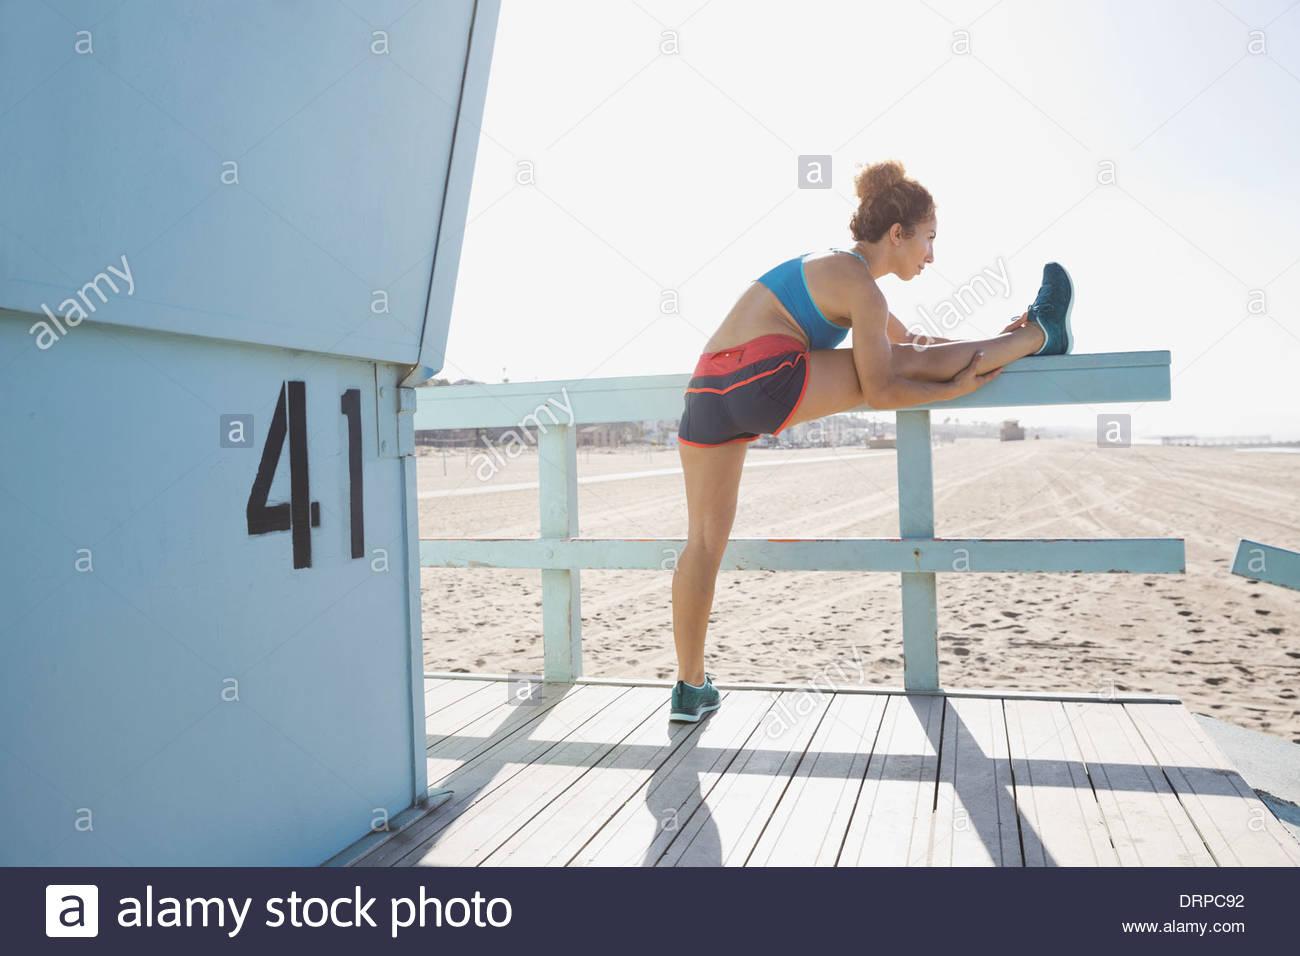 Woman stretching jambes entraînement avant Photo Stock